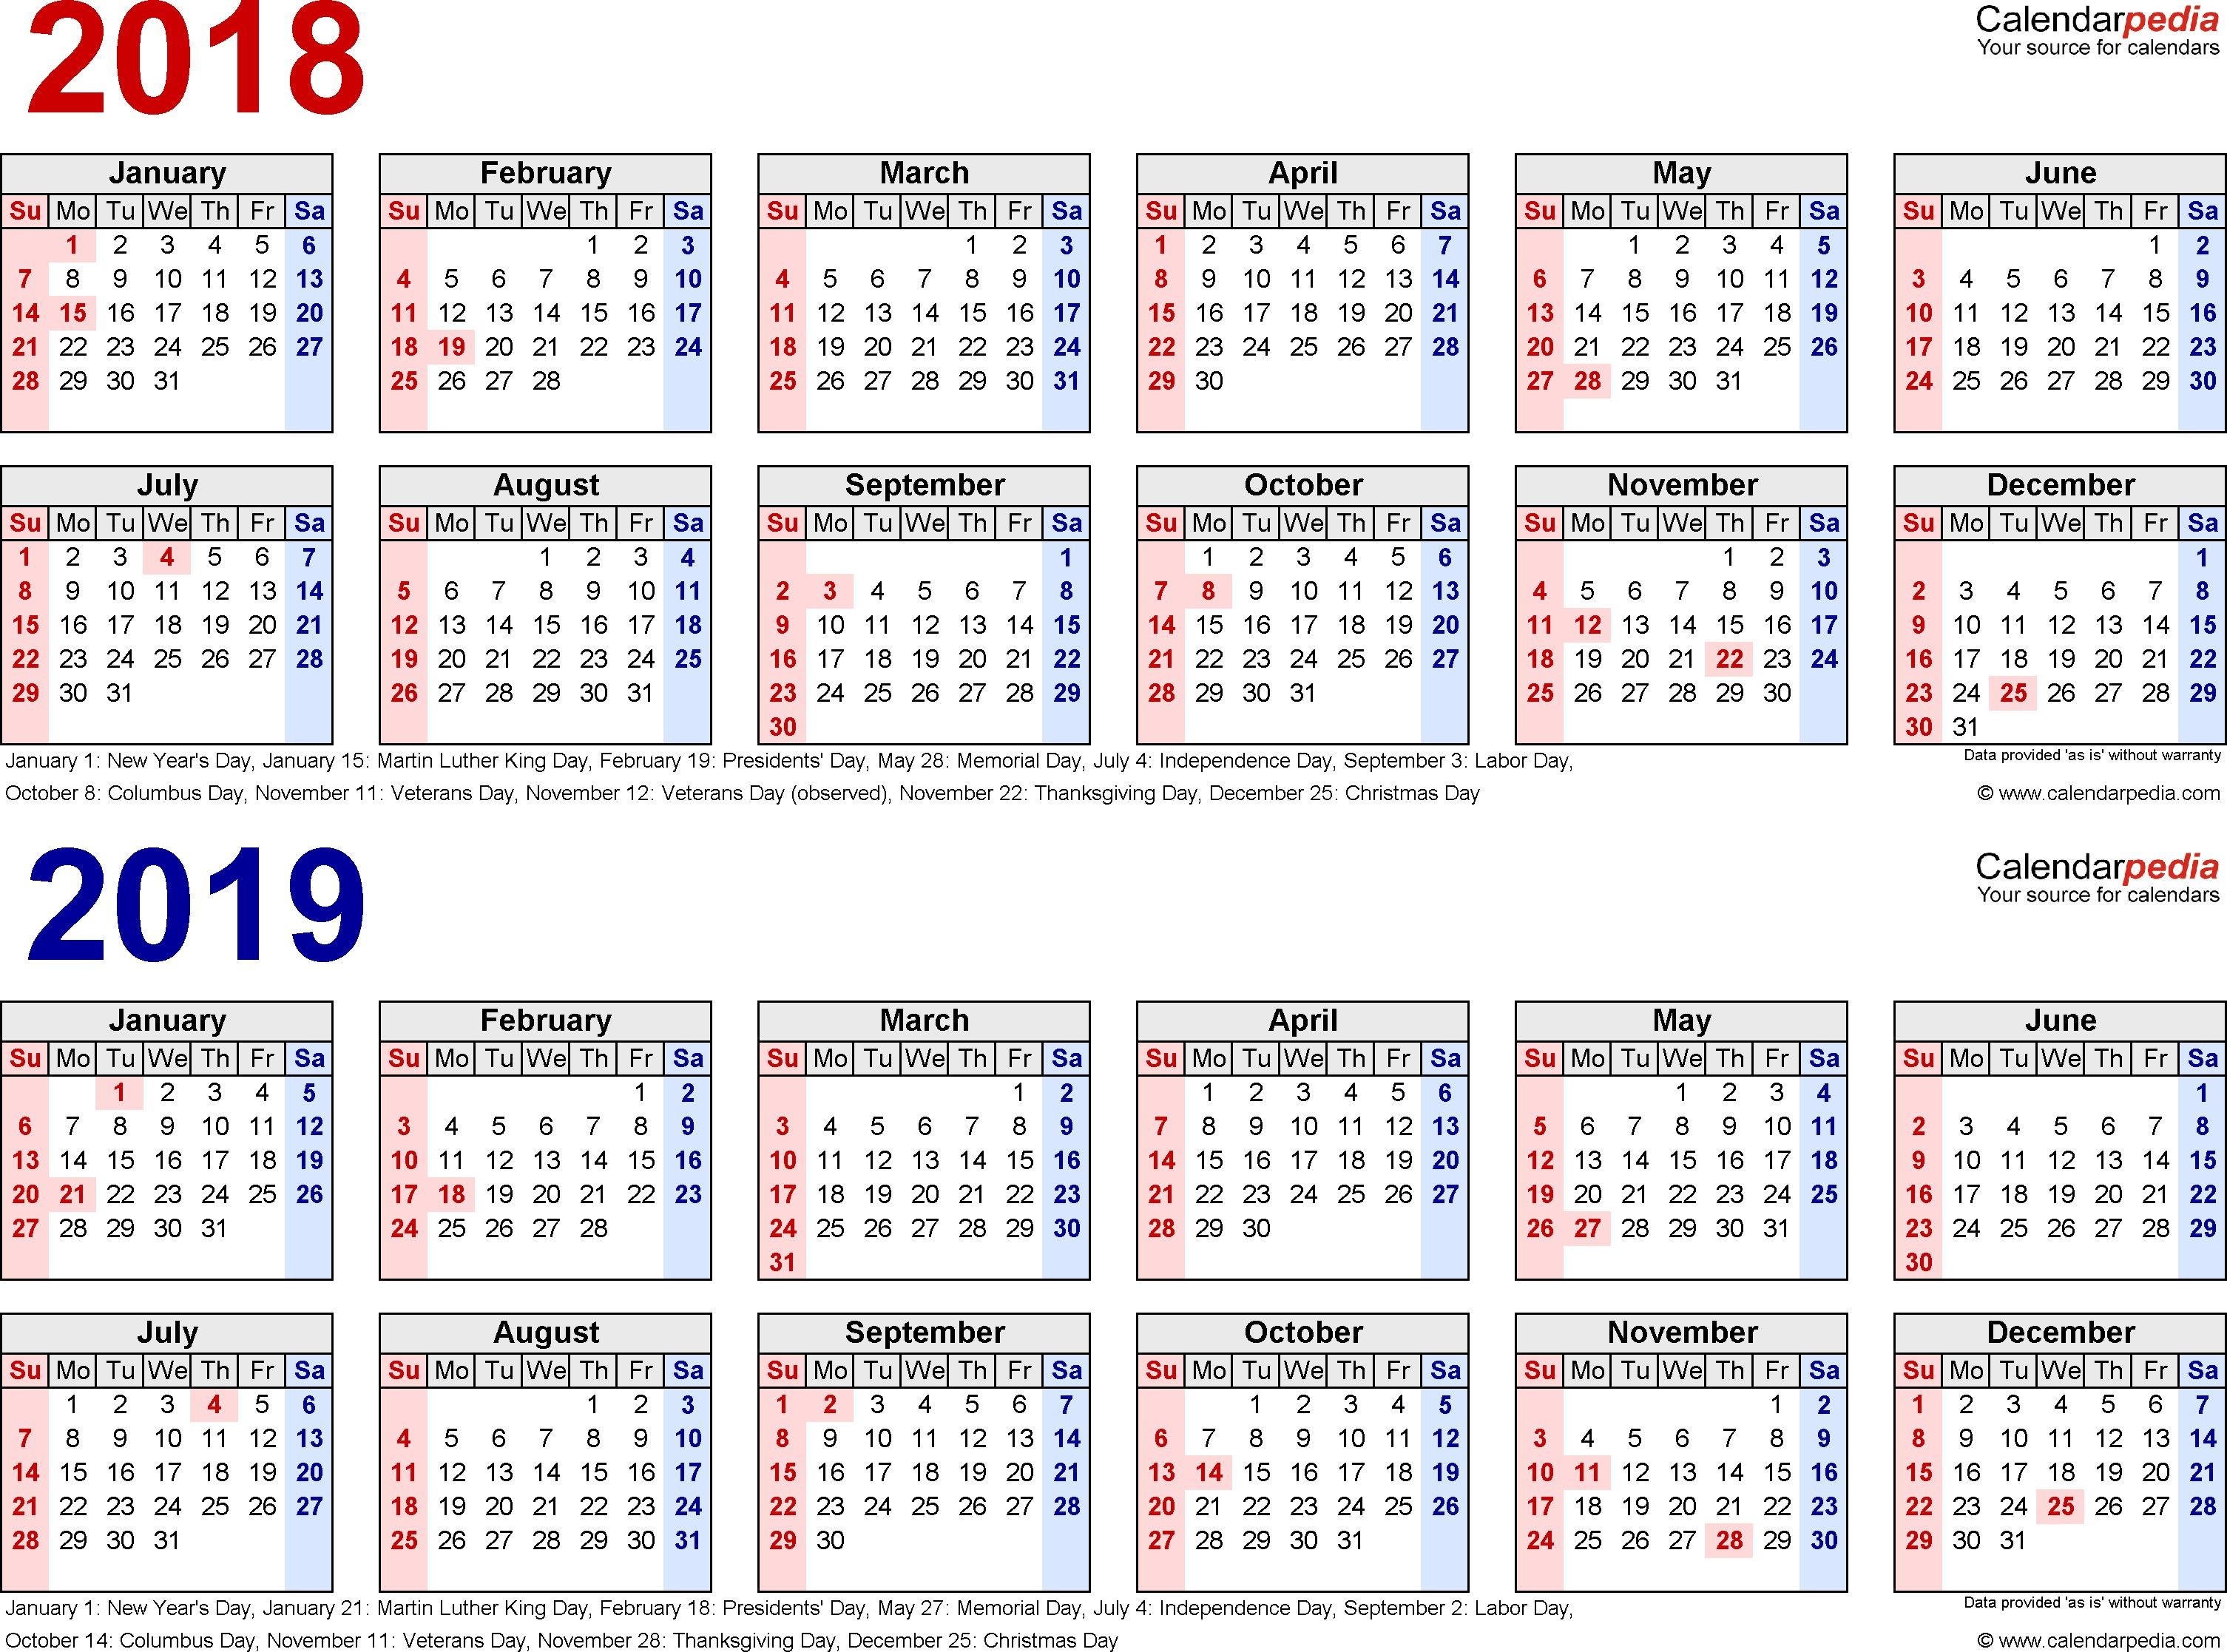 Free Printable 2018 Pay Period Calendars Blank Calendar